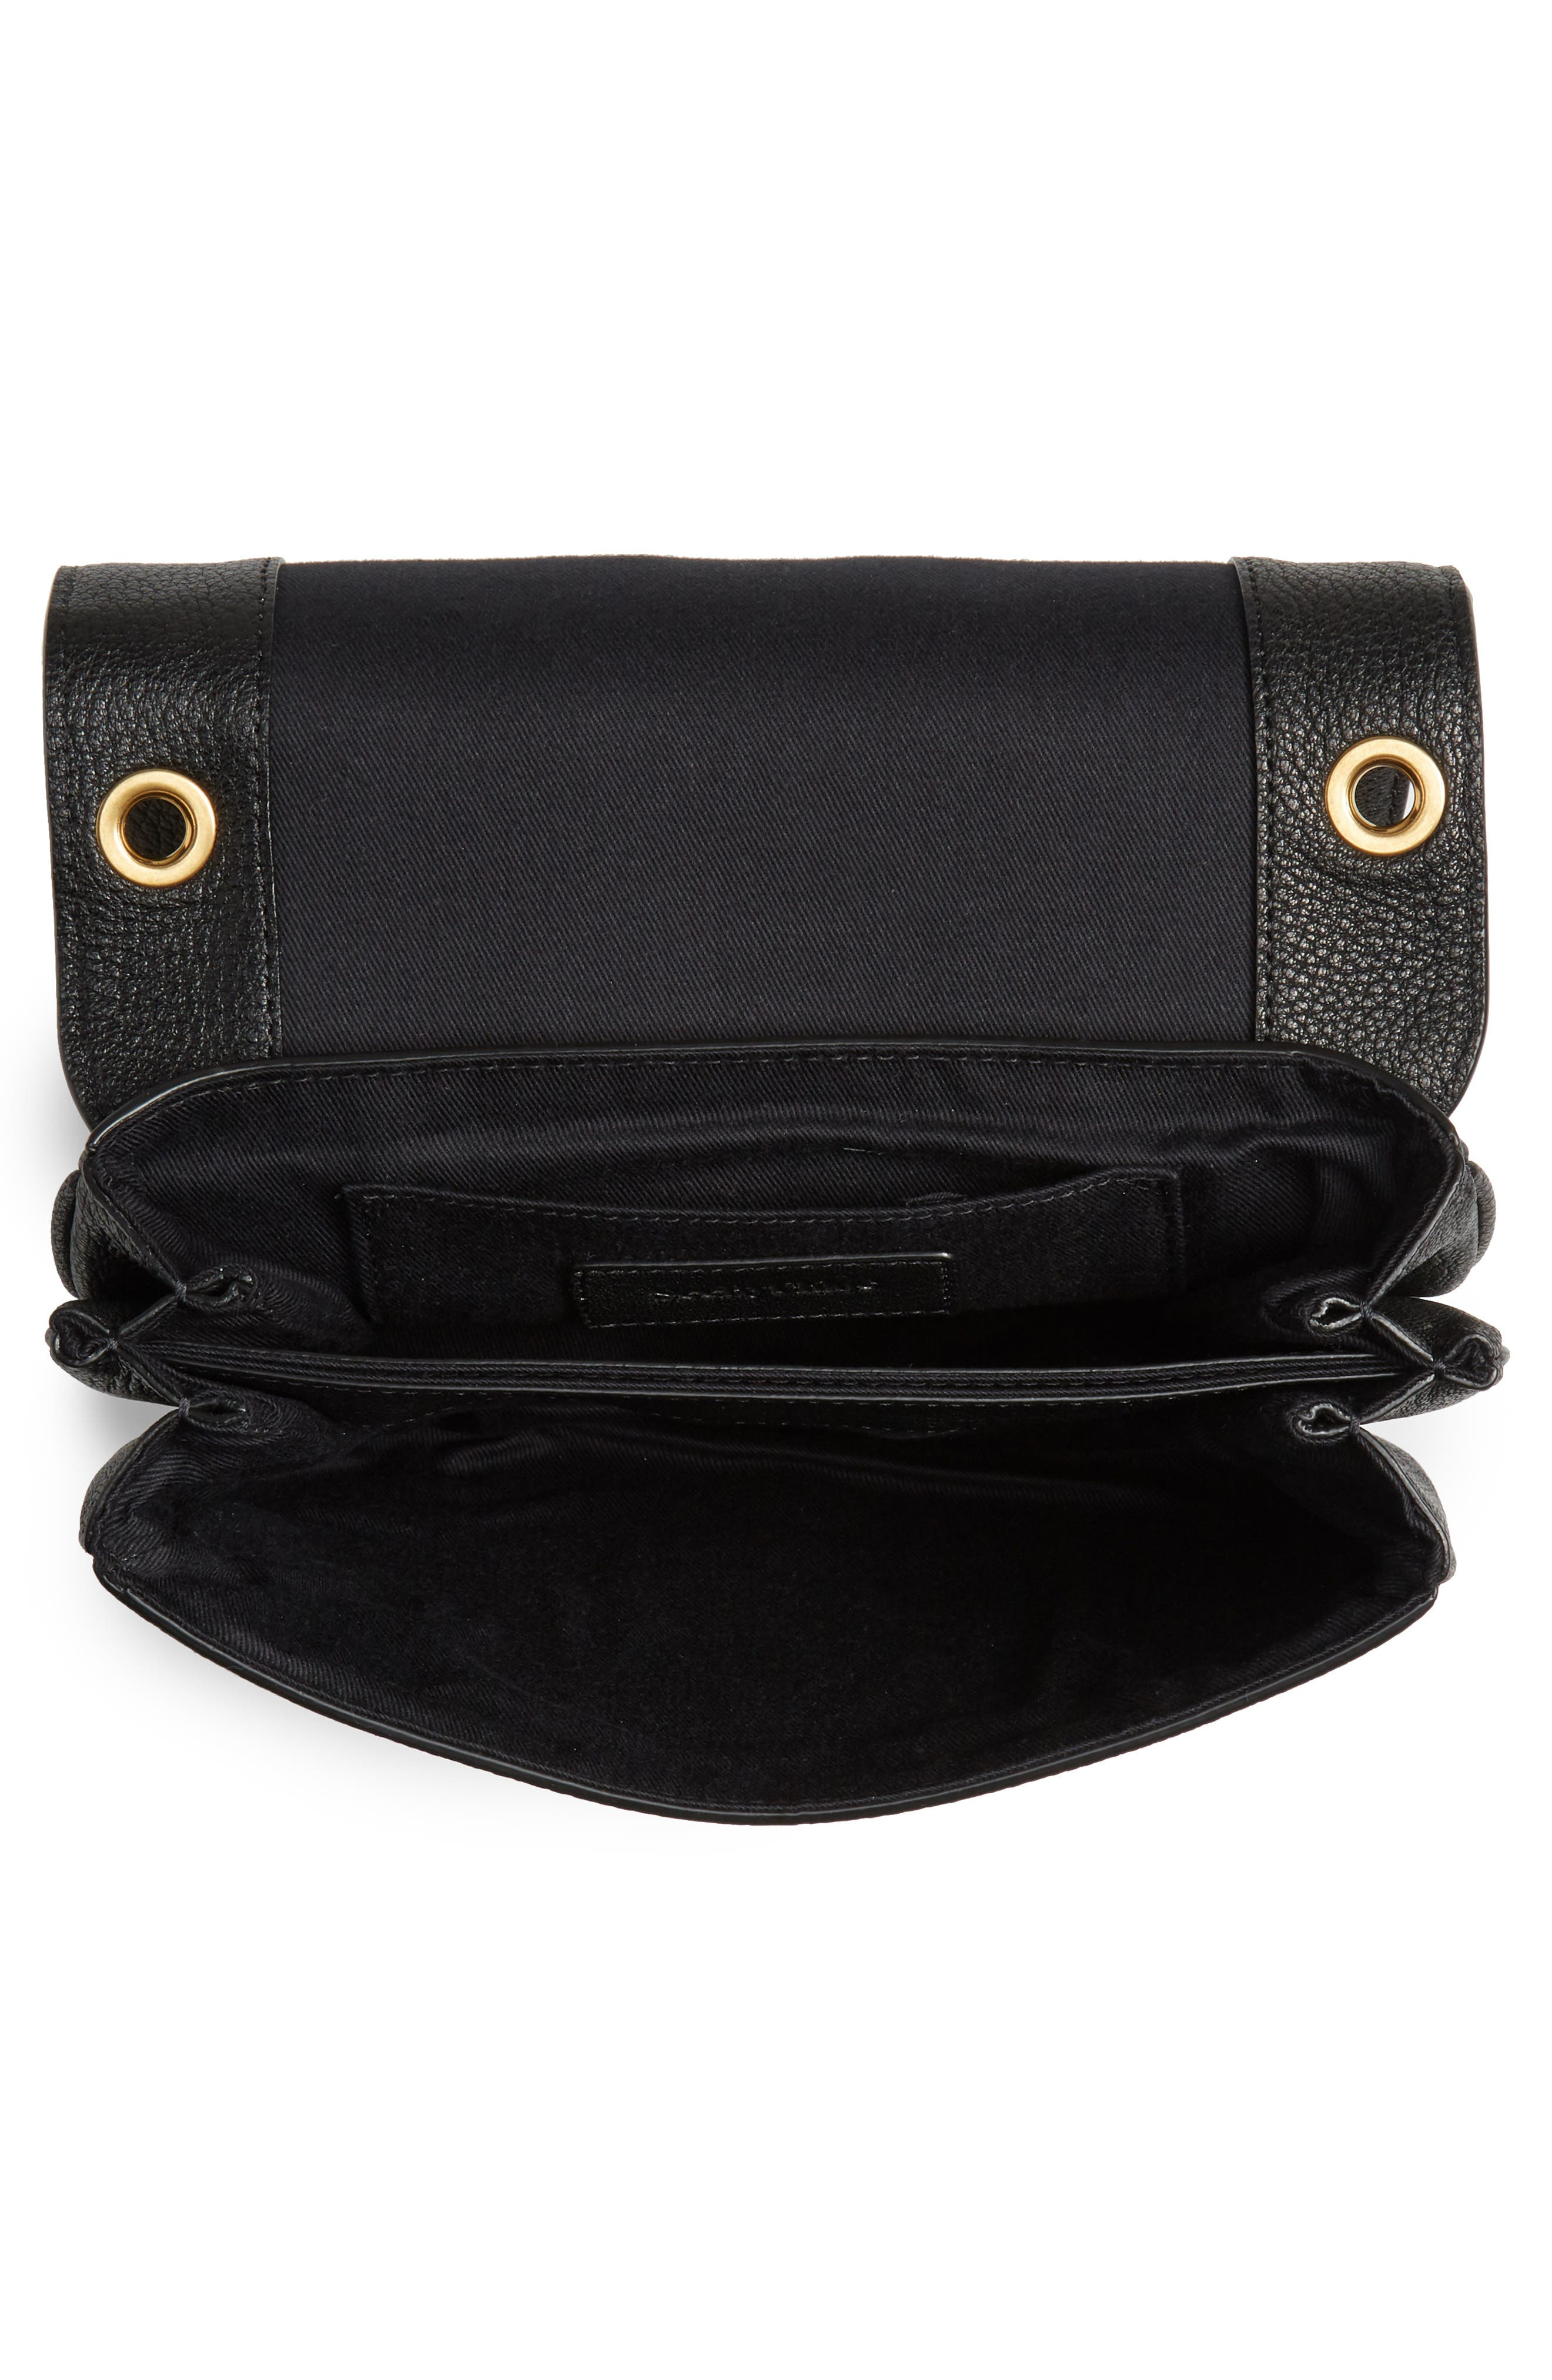 SEE BY CHLOÉ, Hana Small Leather Crossbody Bag, Alternate thumbnail 4, color, 001